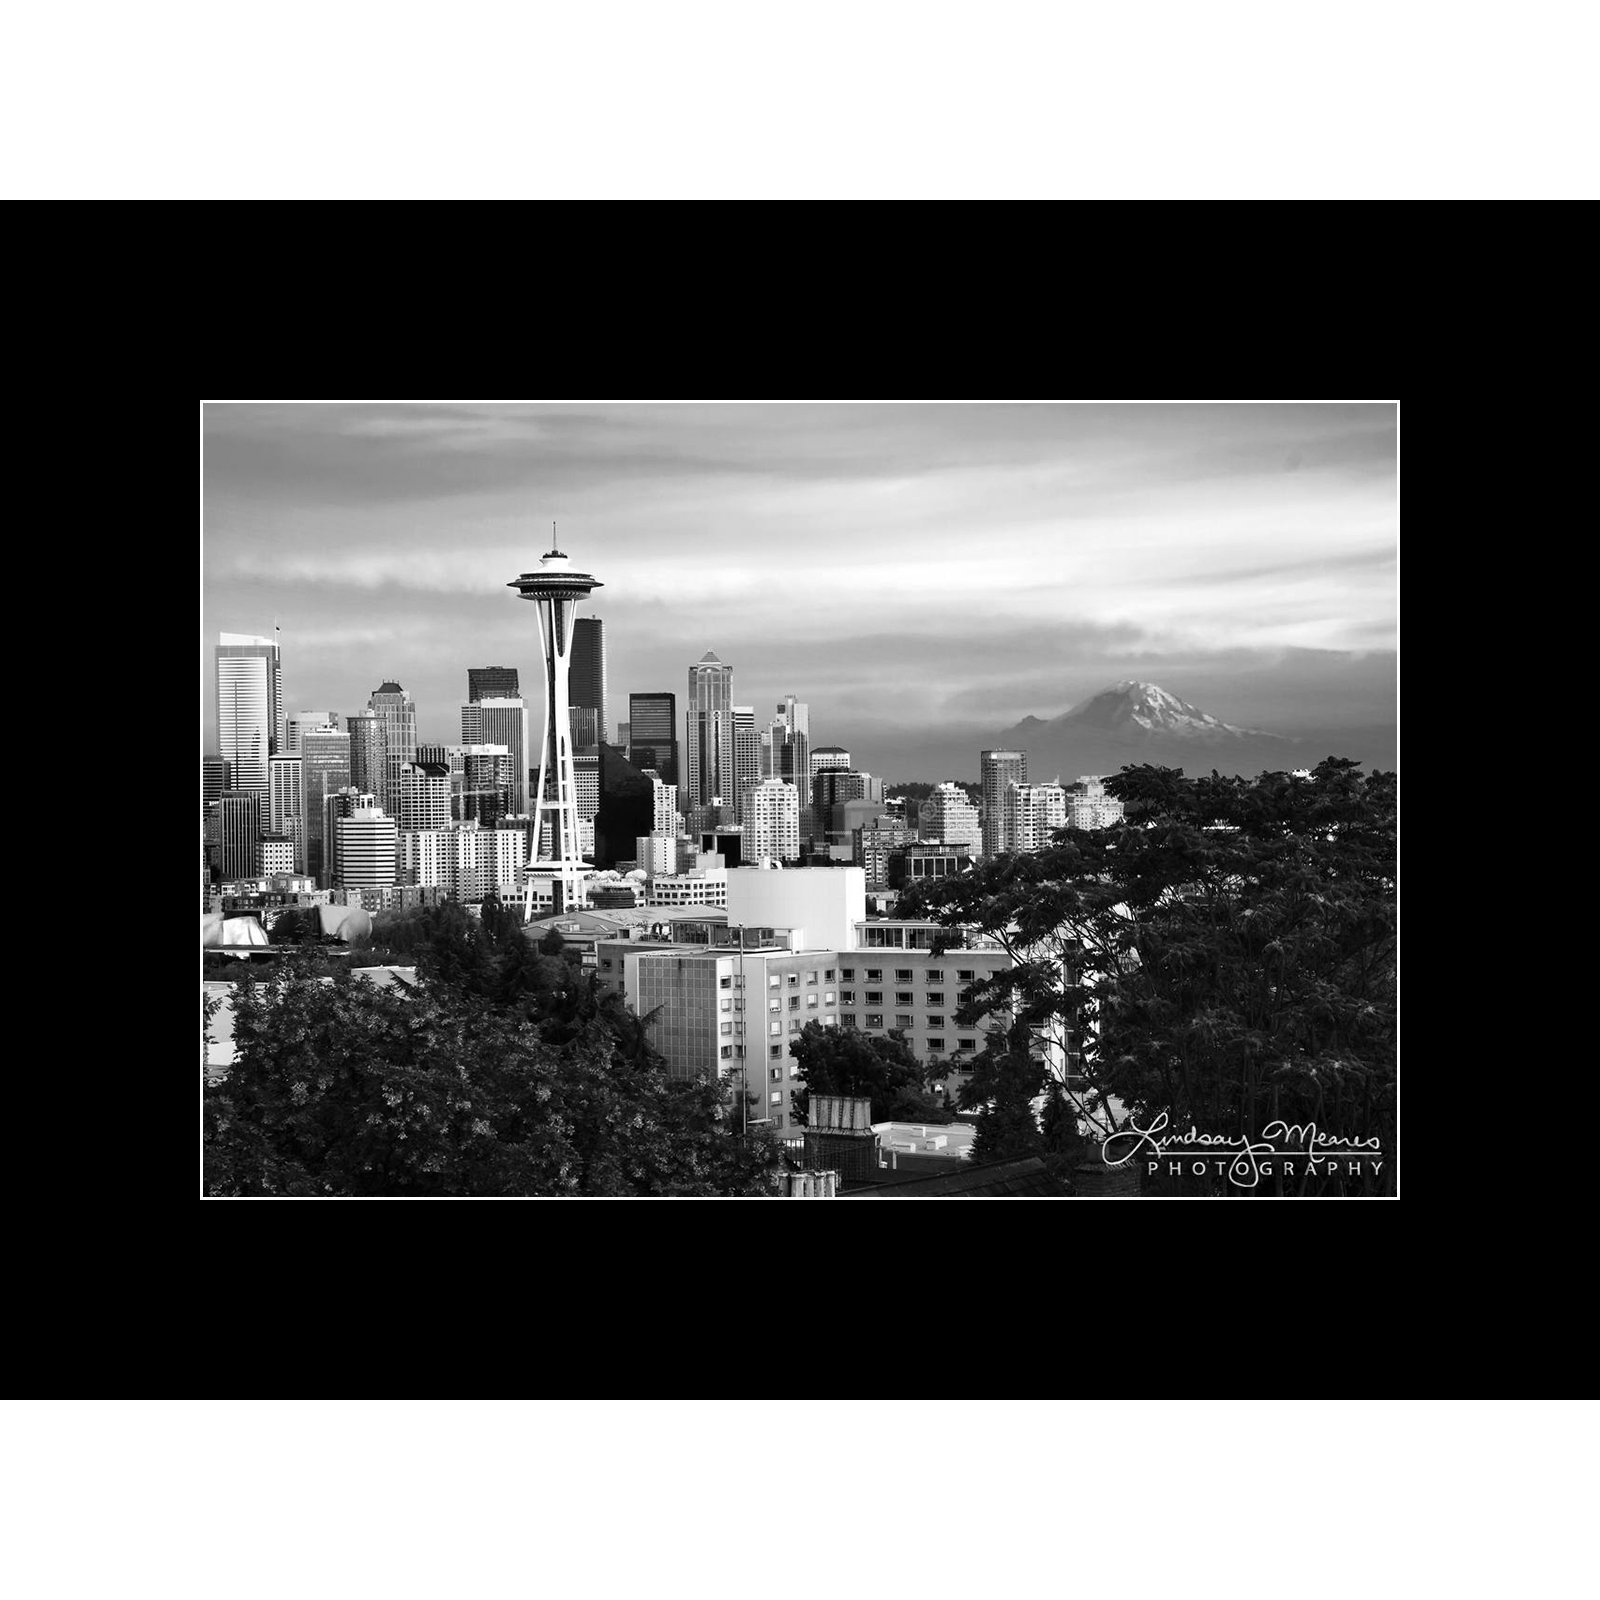 B&W Seattle Wall Art, 8x12 Inch Matted Print, ''Black & White Seattle Sunset'' by TravLin Photography